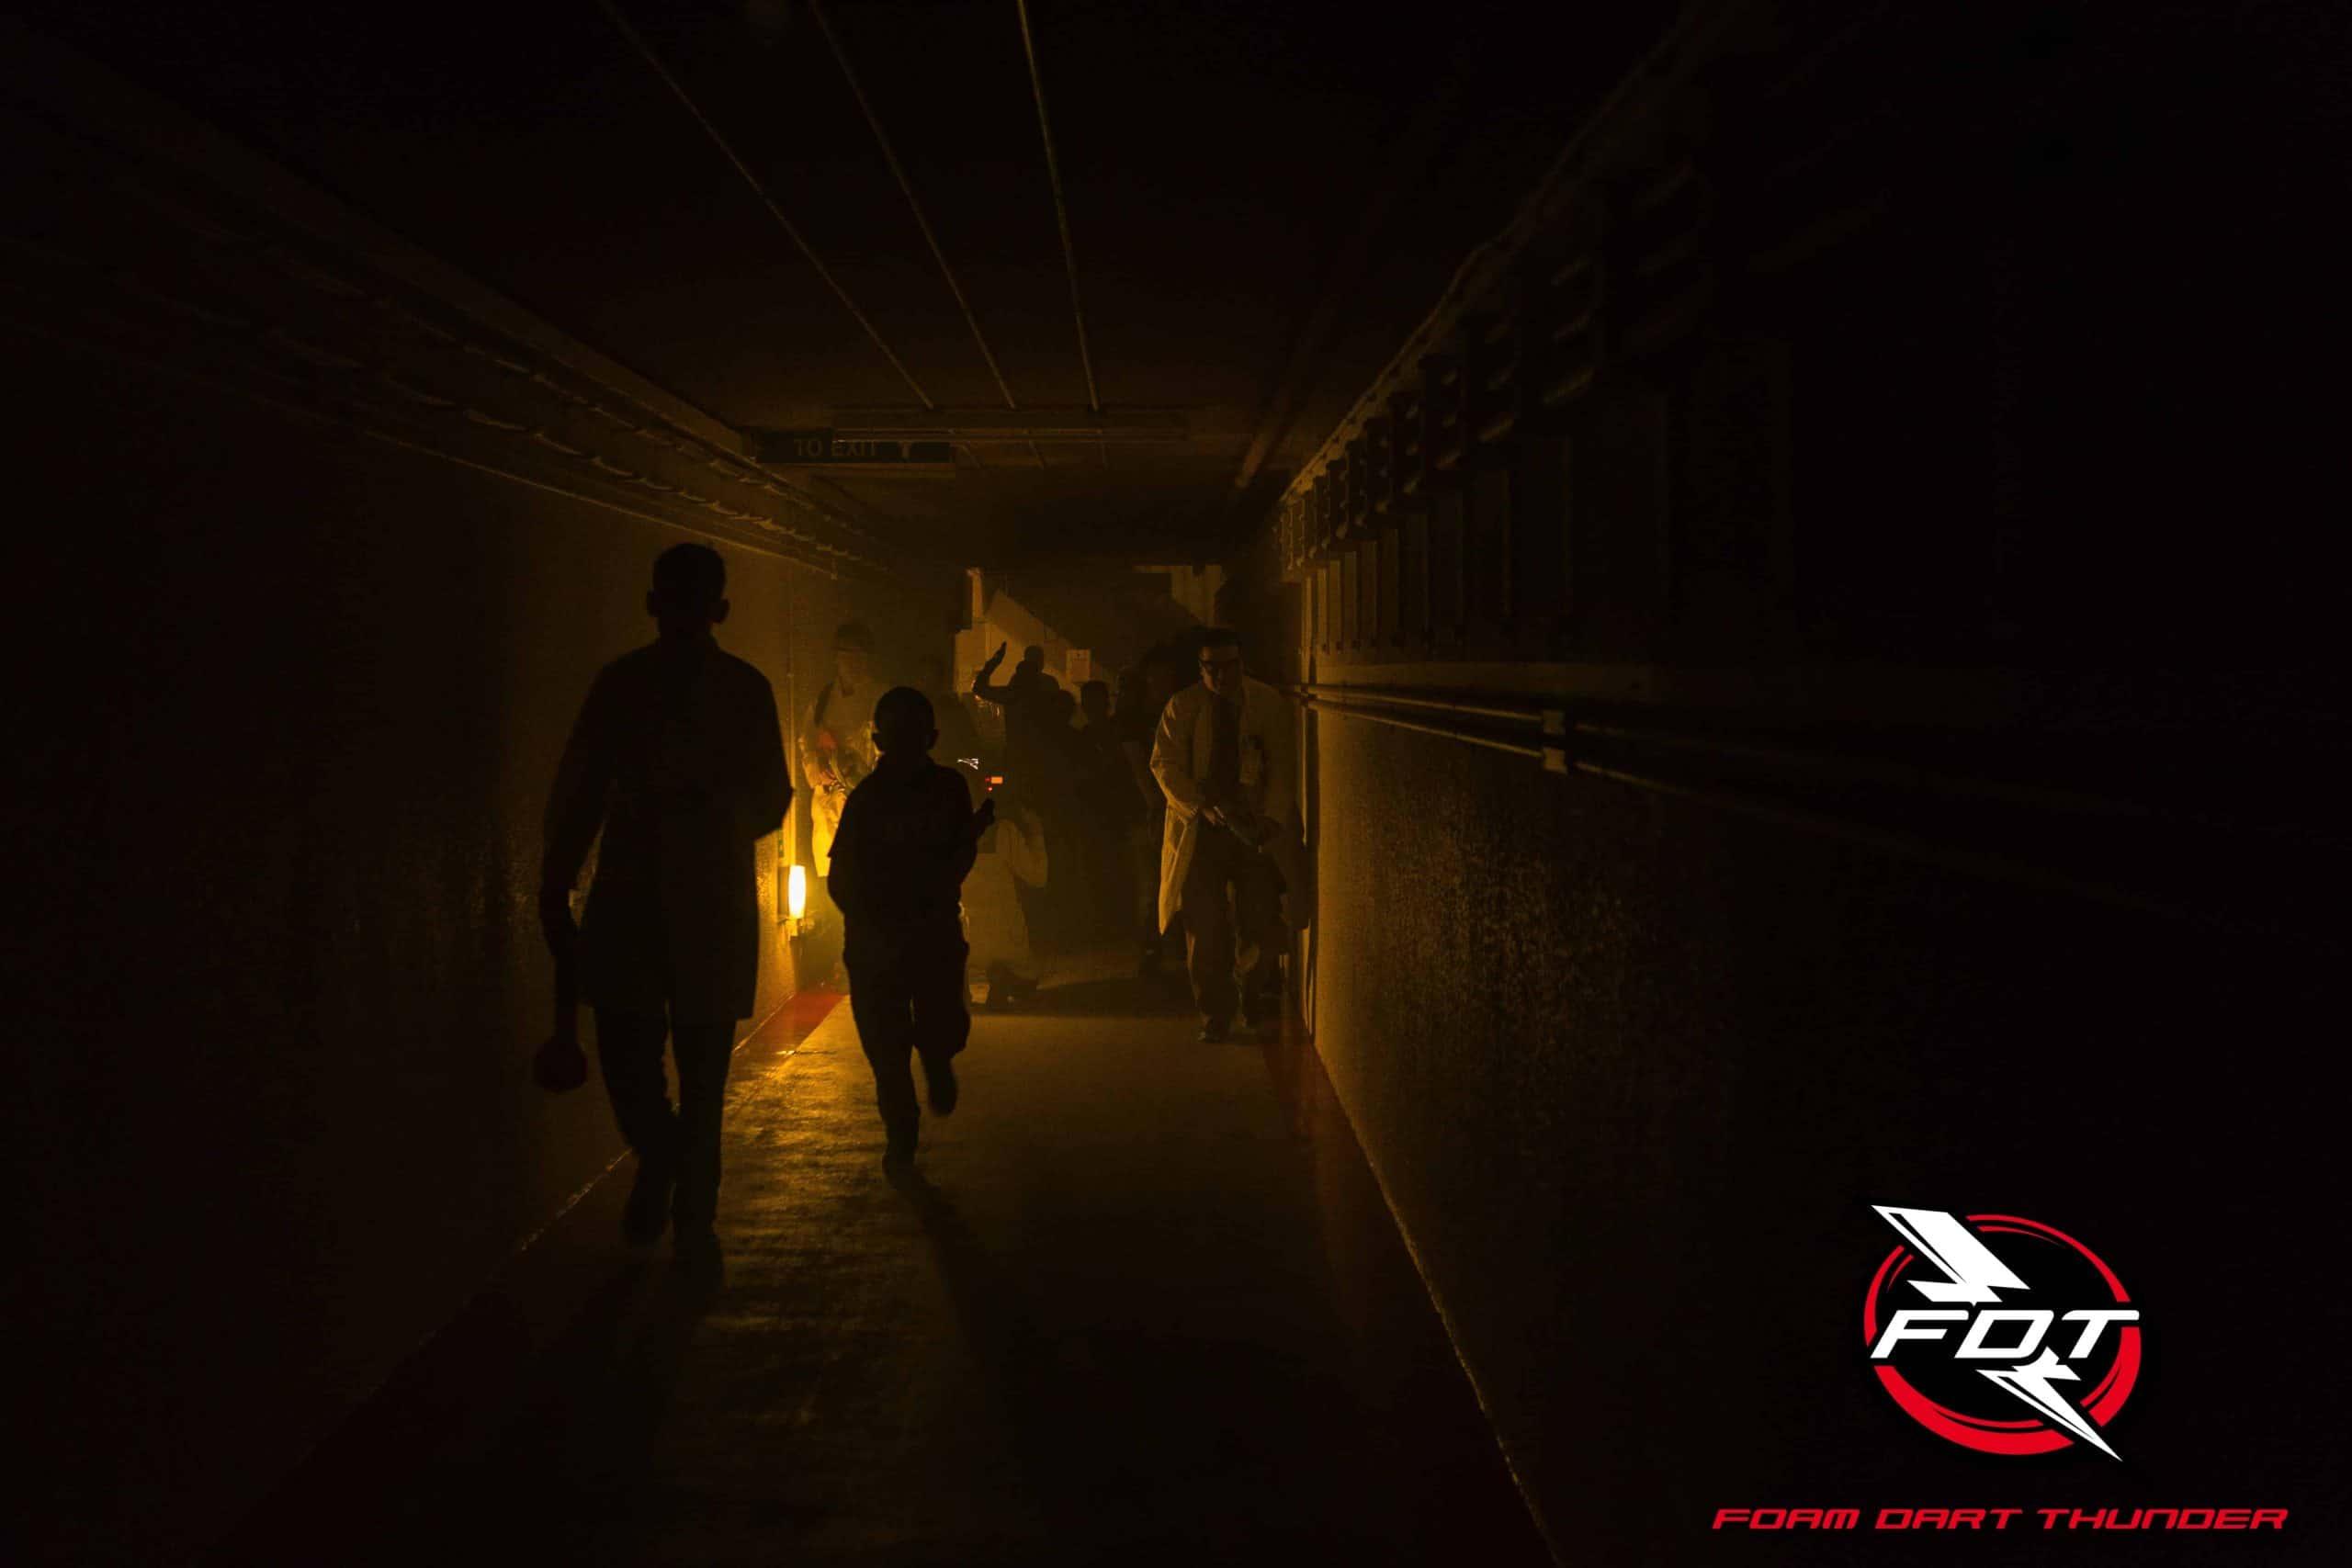 Foam Dart Bunker – Defend The Core Video 2!